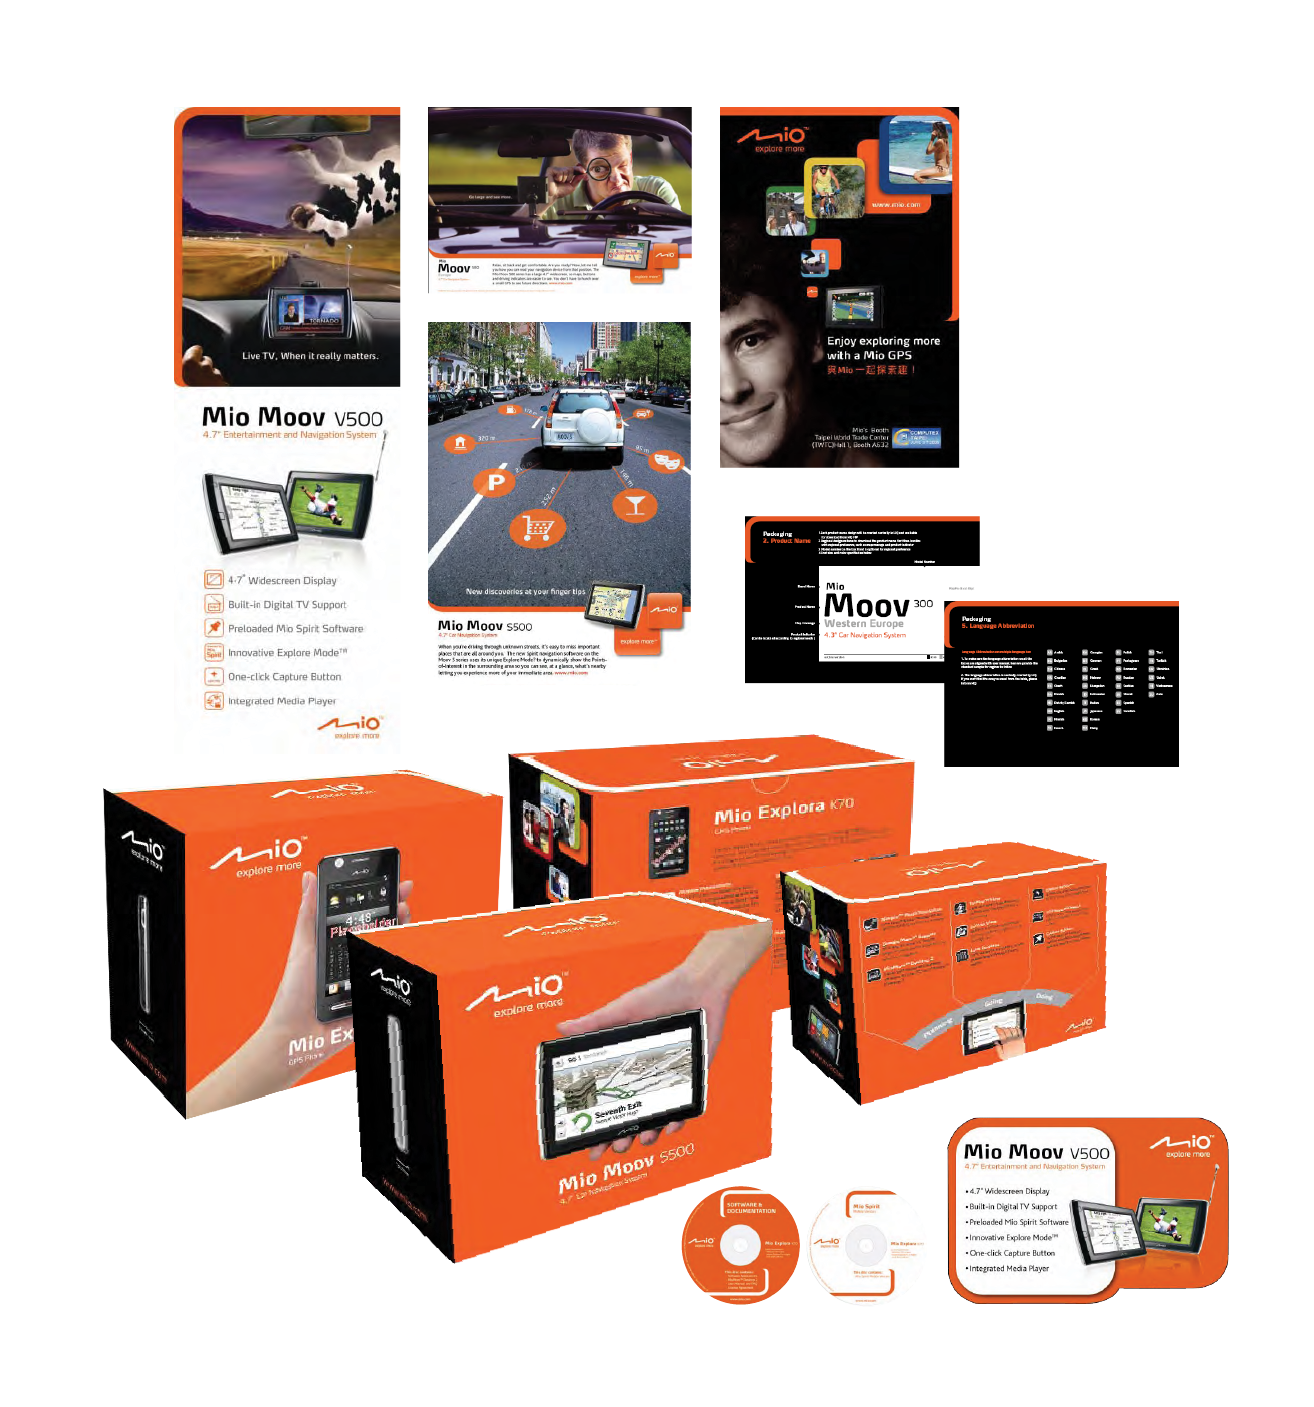 Mio branding and marketing materials